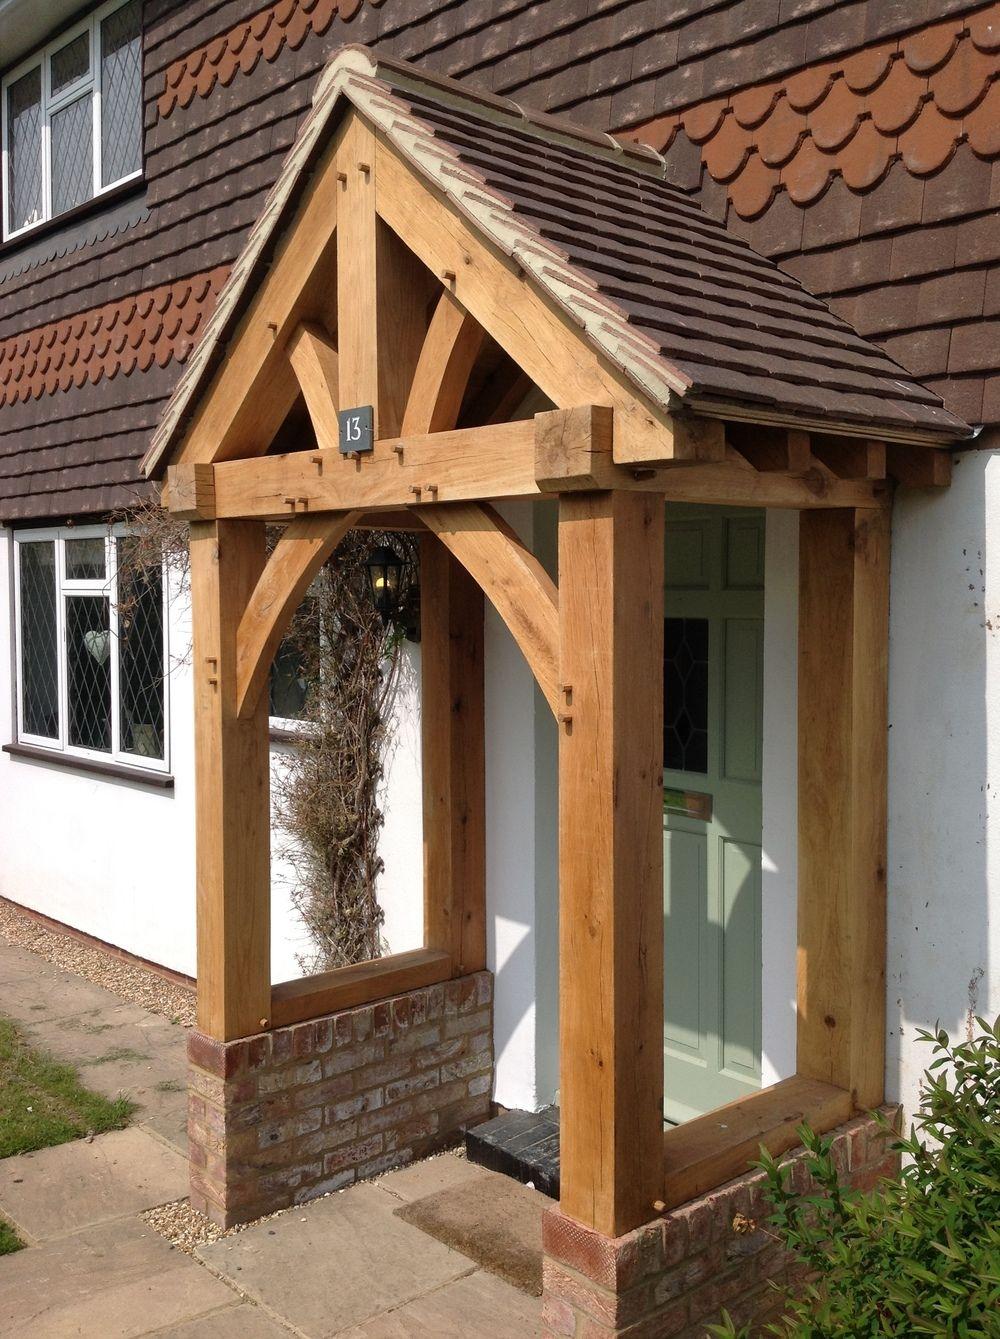 Design Of The Wooden Porch Timber Frame Porch Porch Design